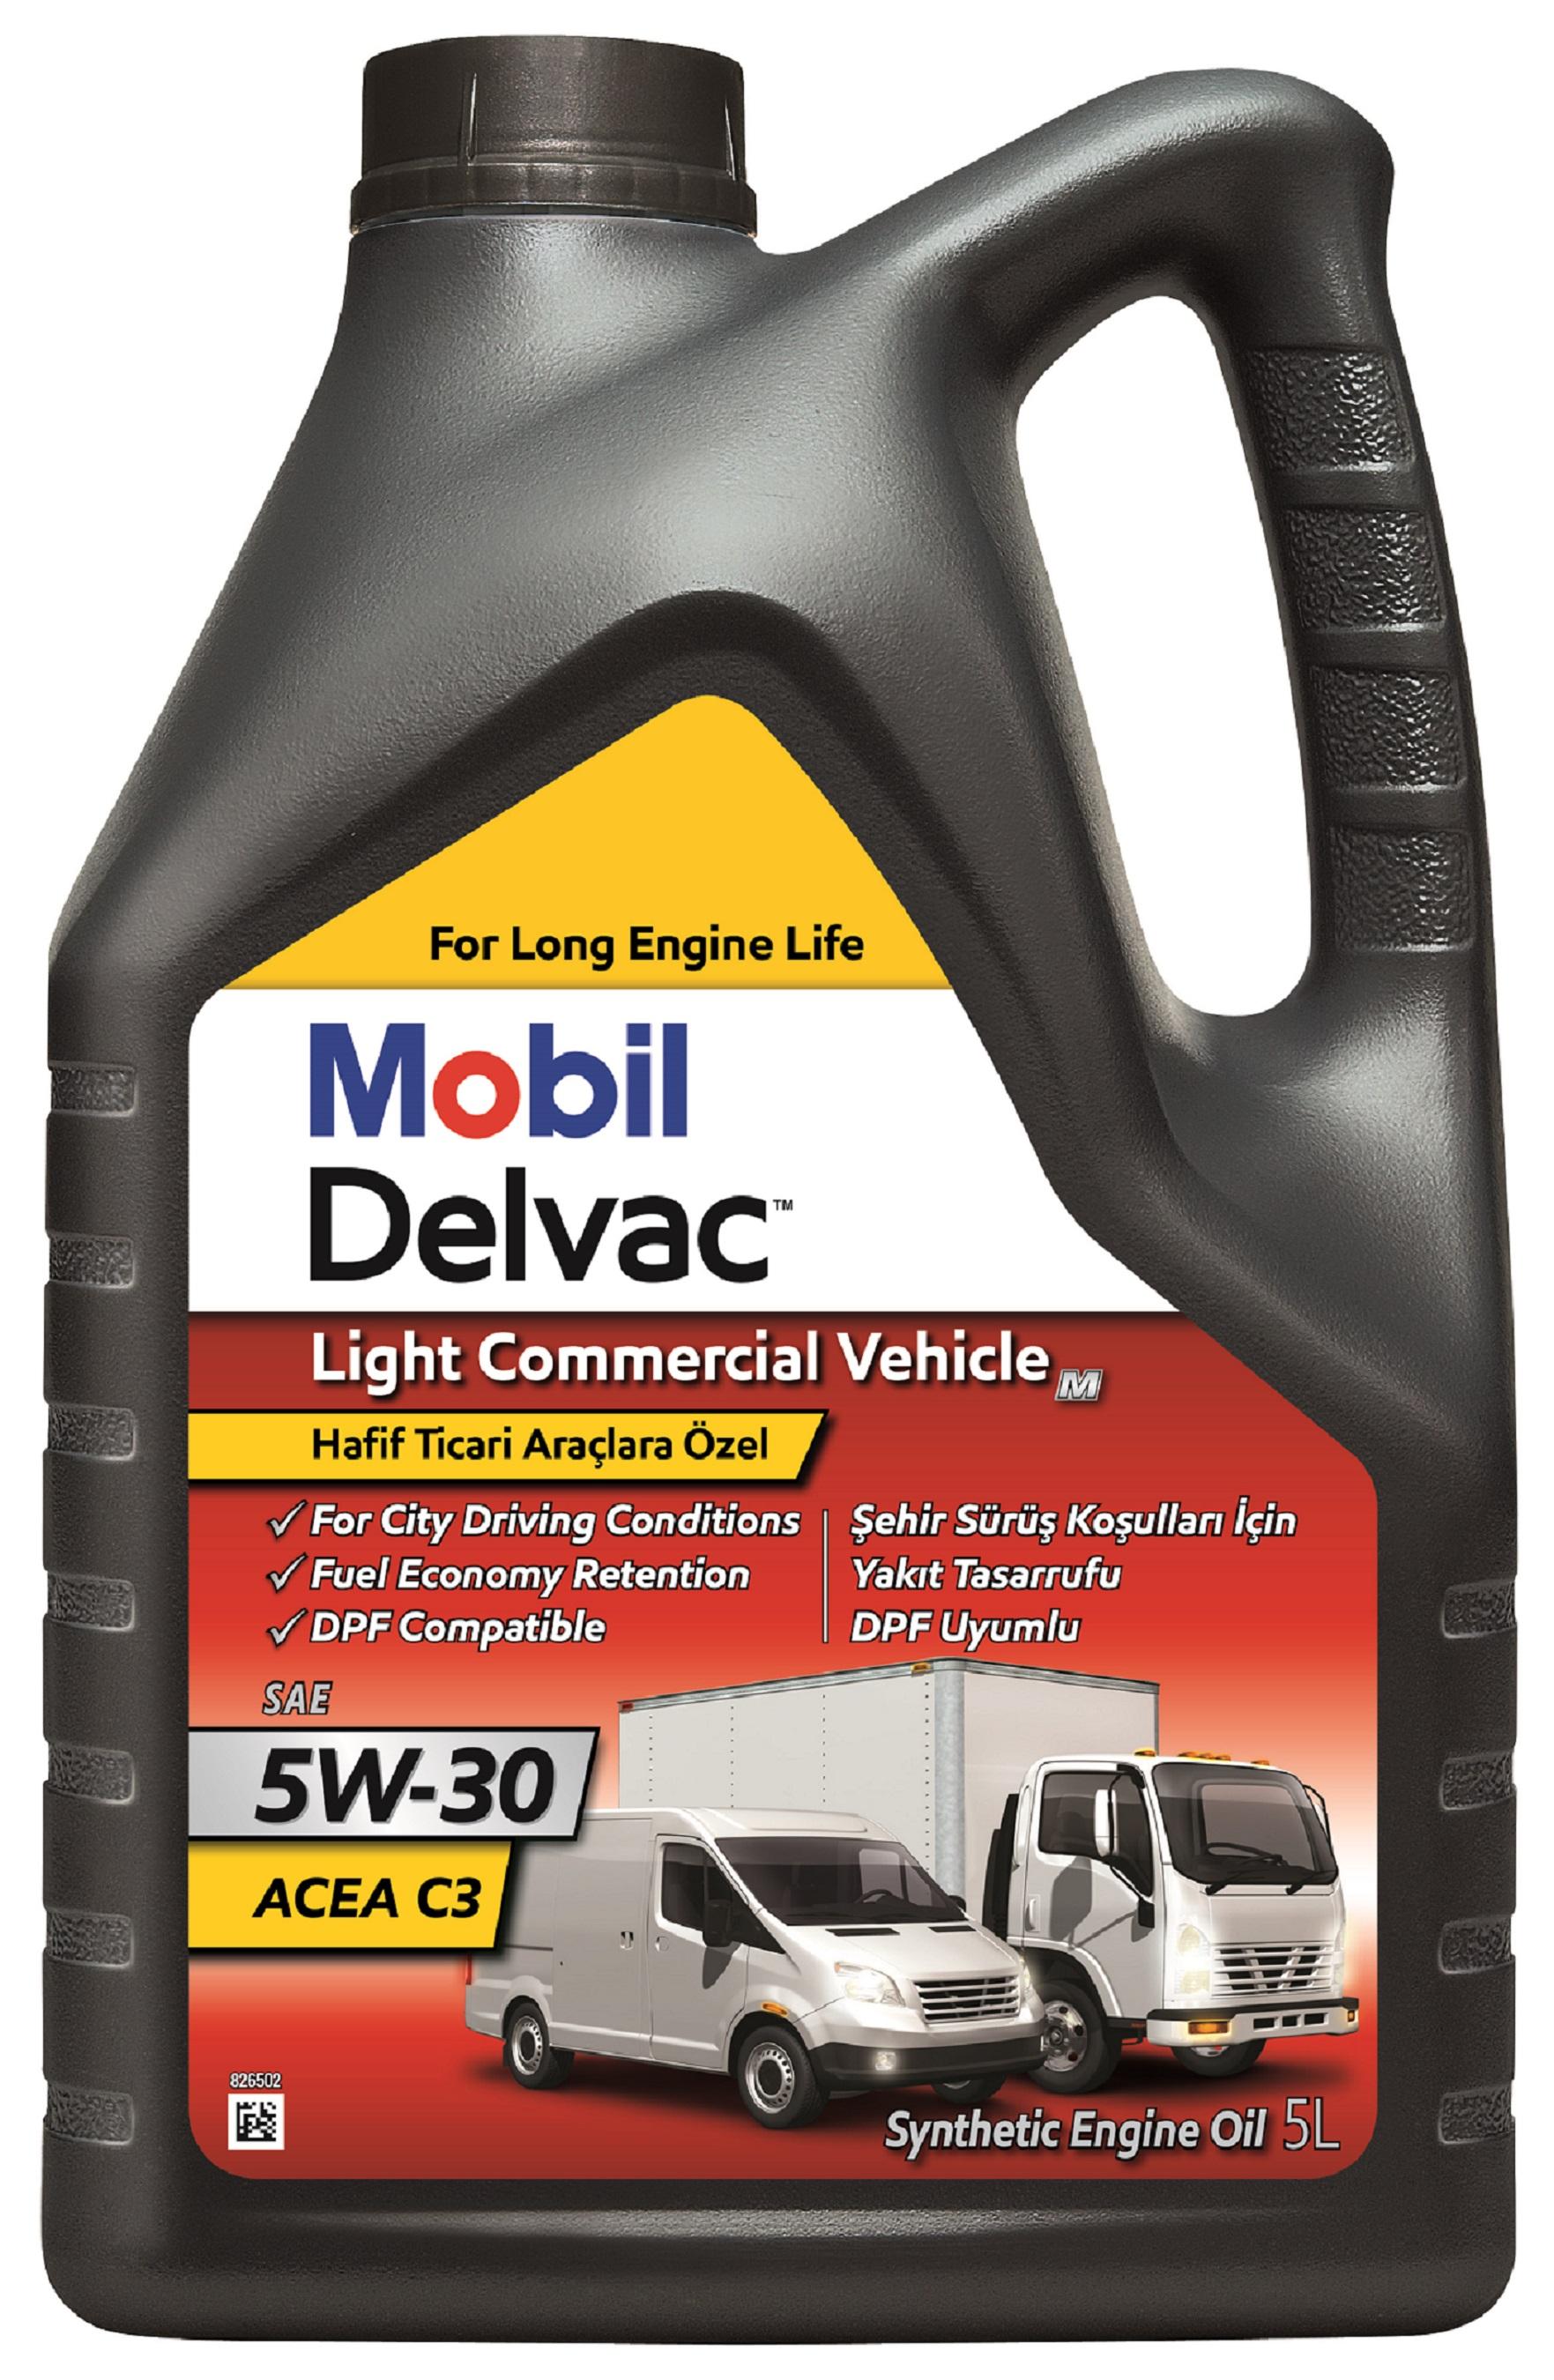 mobil-delvac-lcv-m-5w-30-gsp-4x5l.jpg